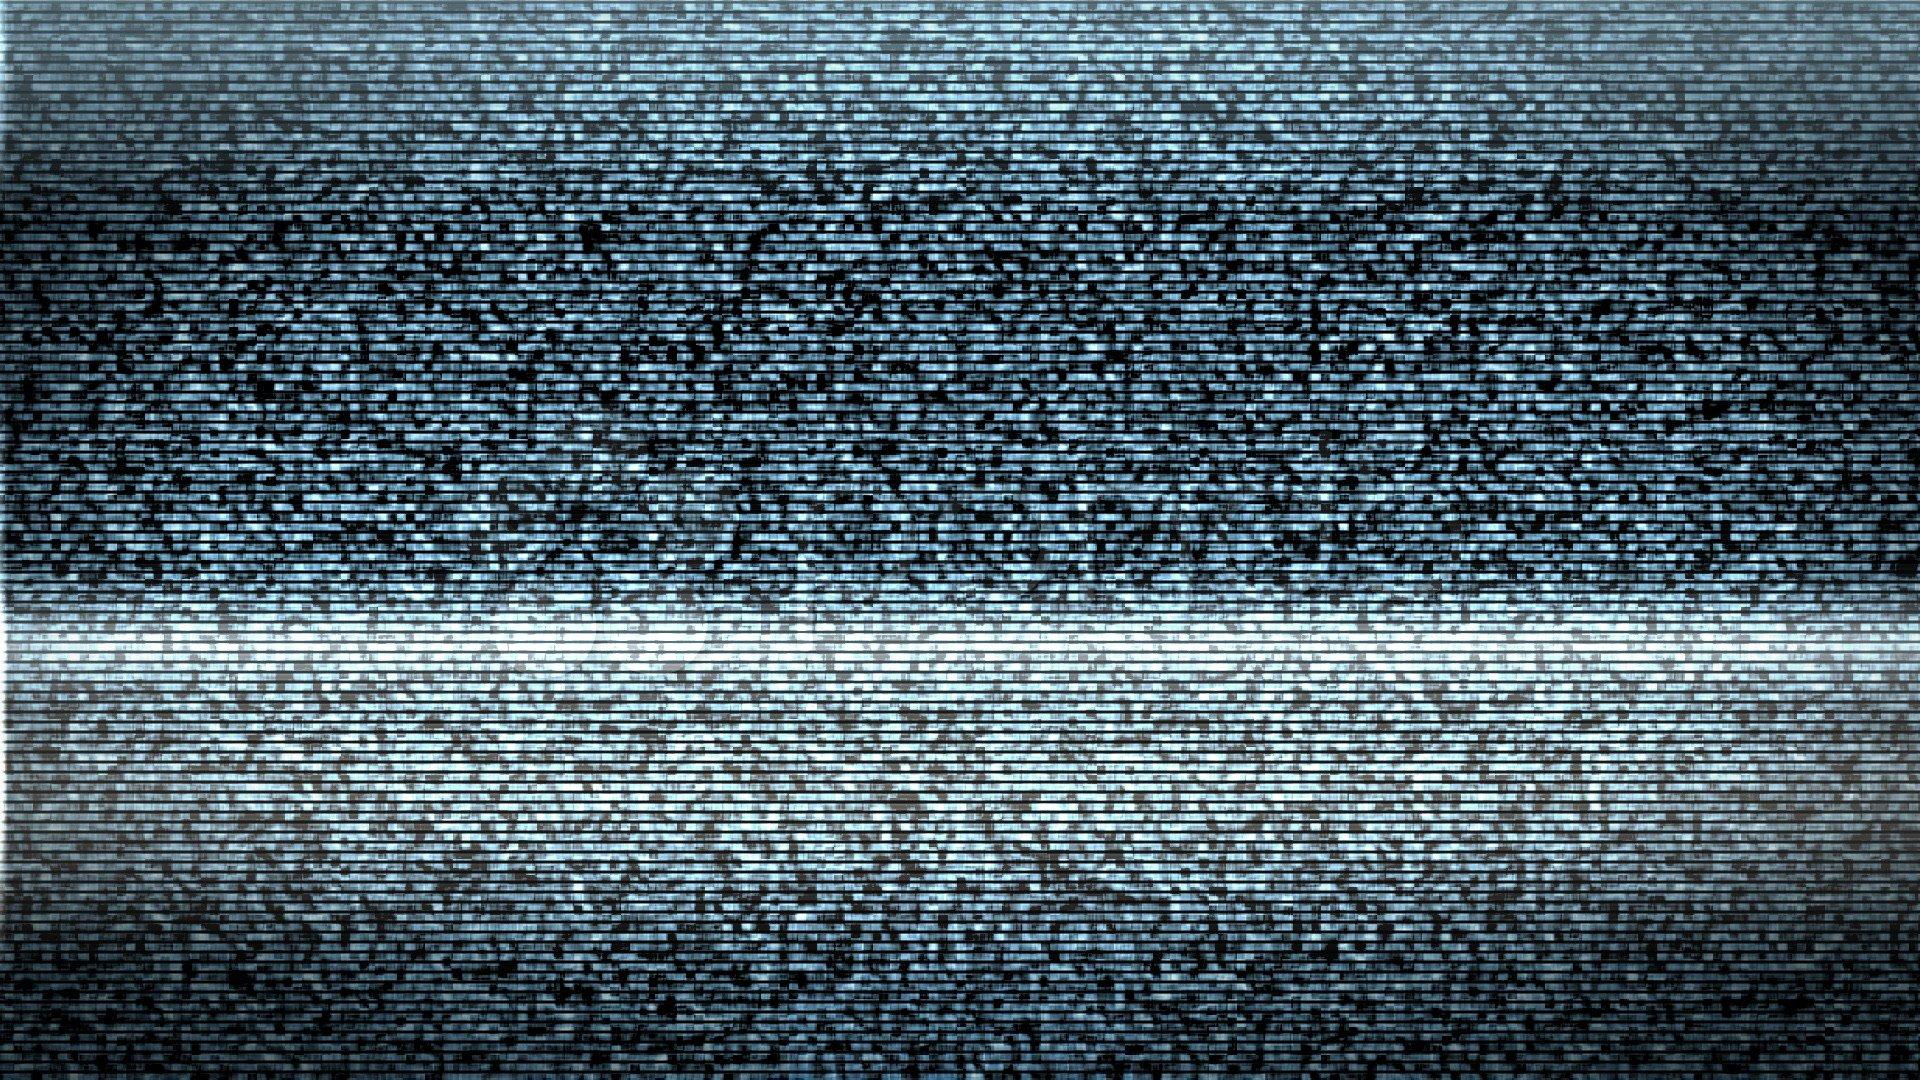 static wallpaper - photo #9